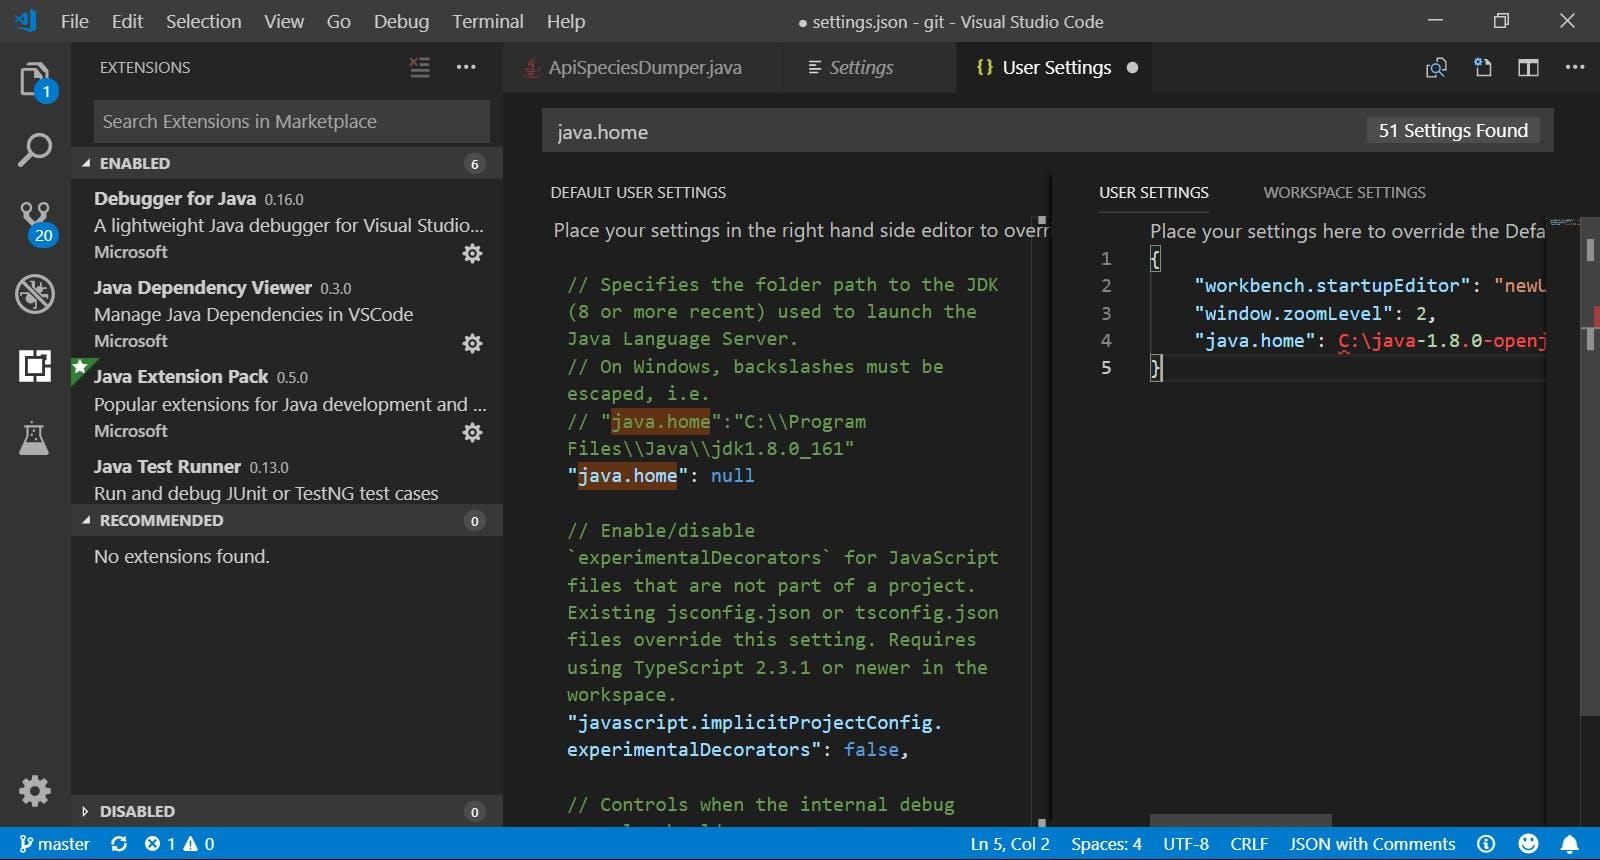 SnapCrab_● settingsjson - git - Visual Studio Code_2019-1-19_22-56-53_No-00.png